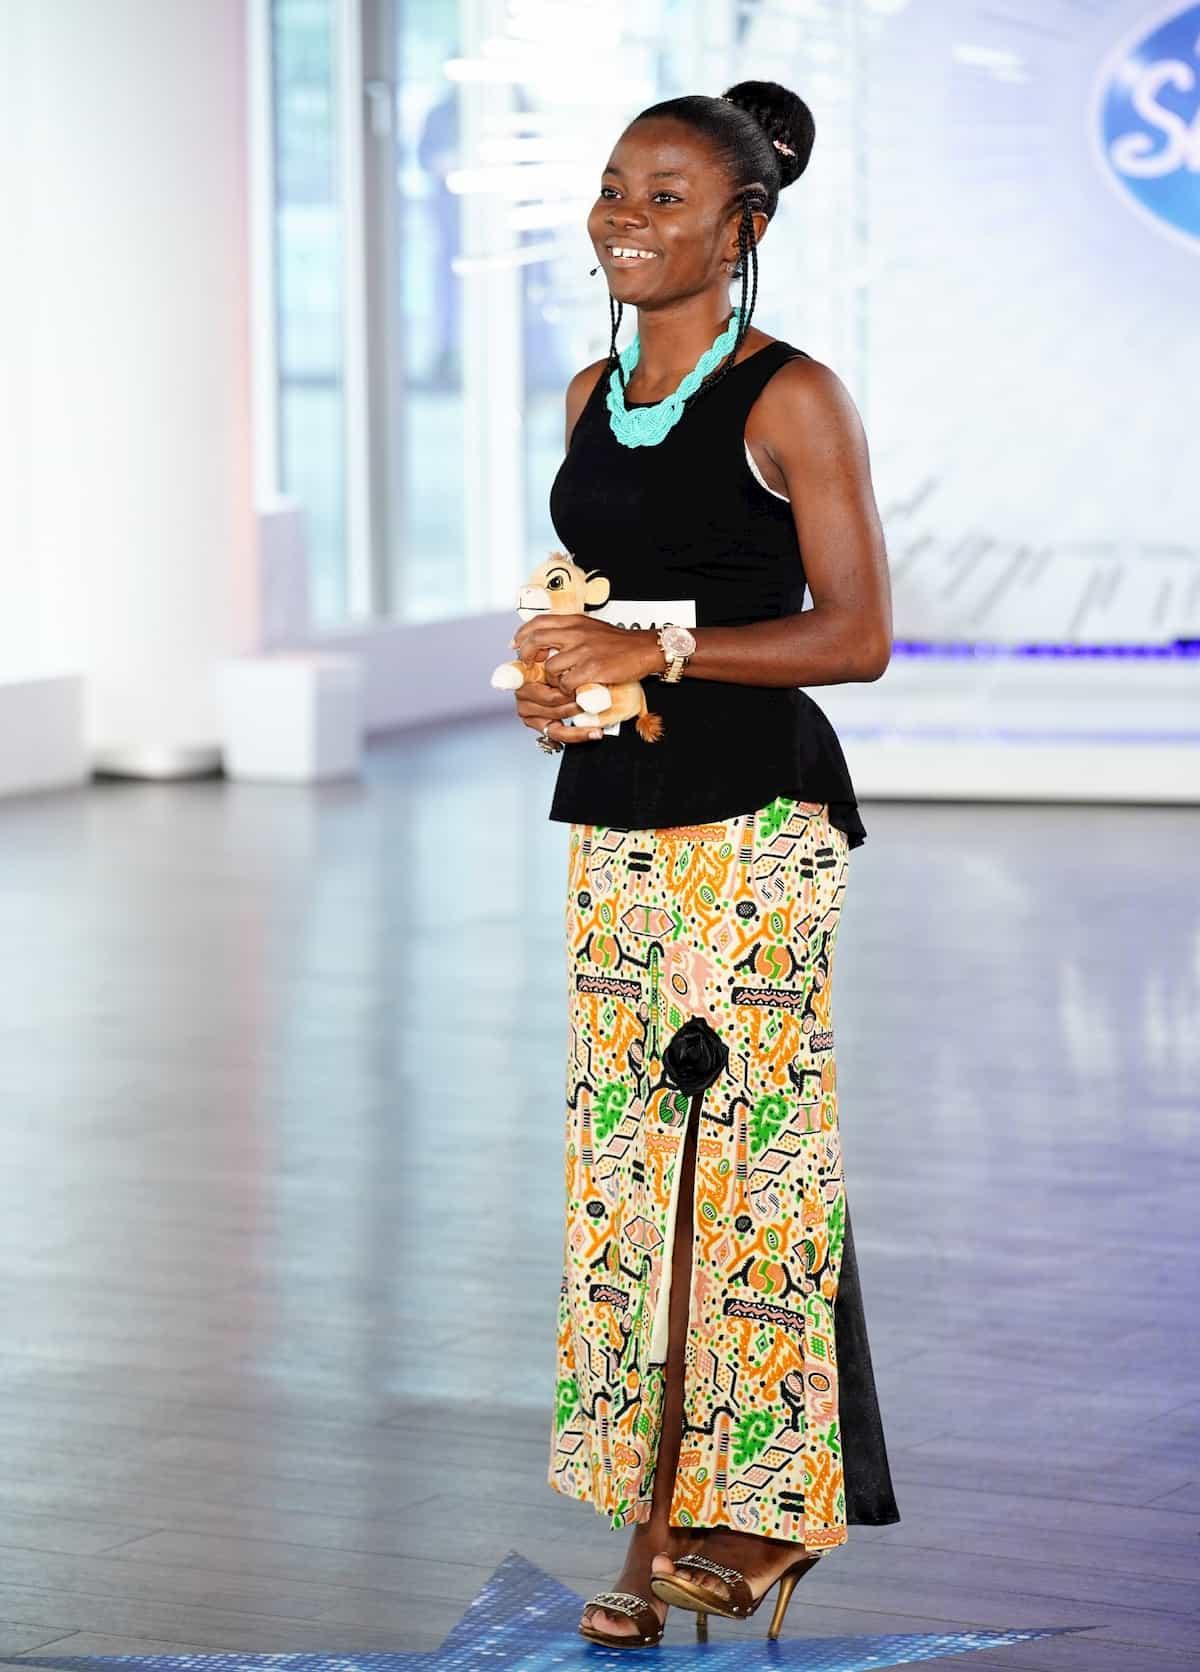 Adele Tankwa Nchoutnsu bei DSDS am 1.2.2020 als Kandidatin